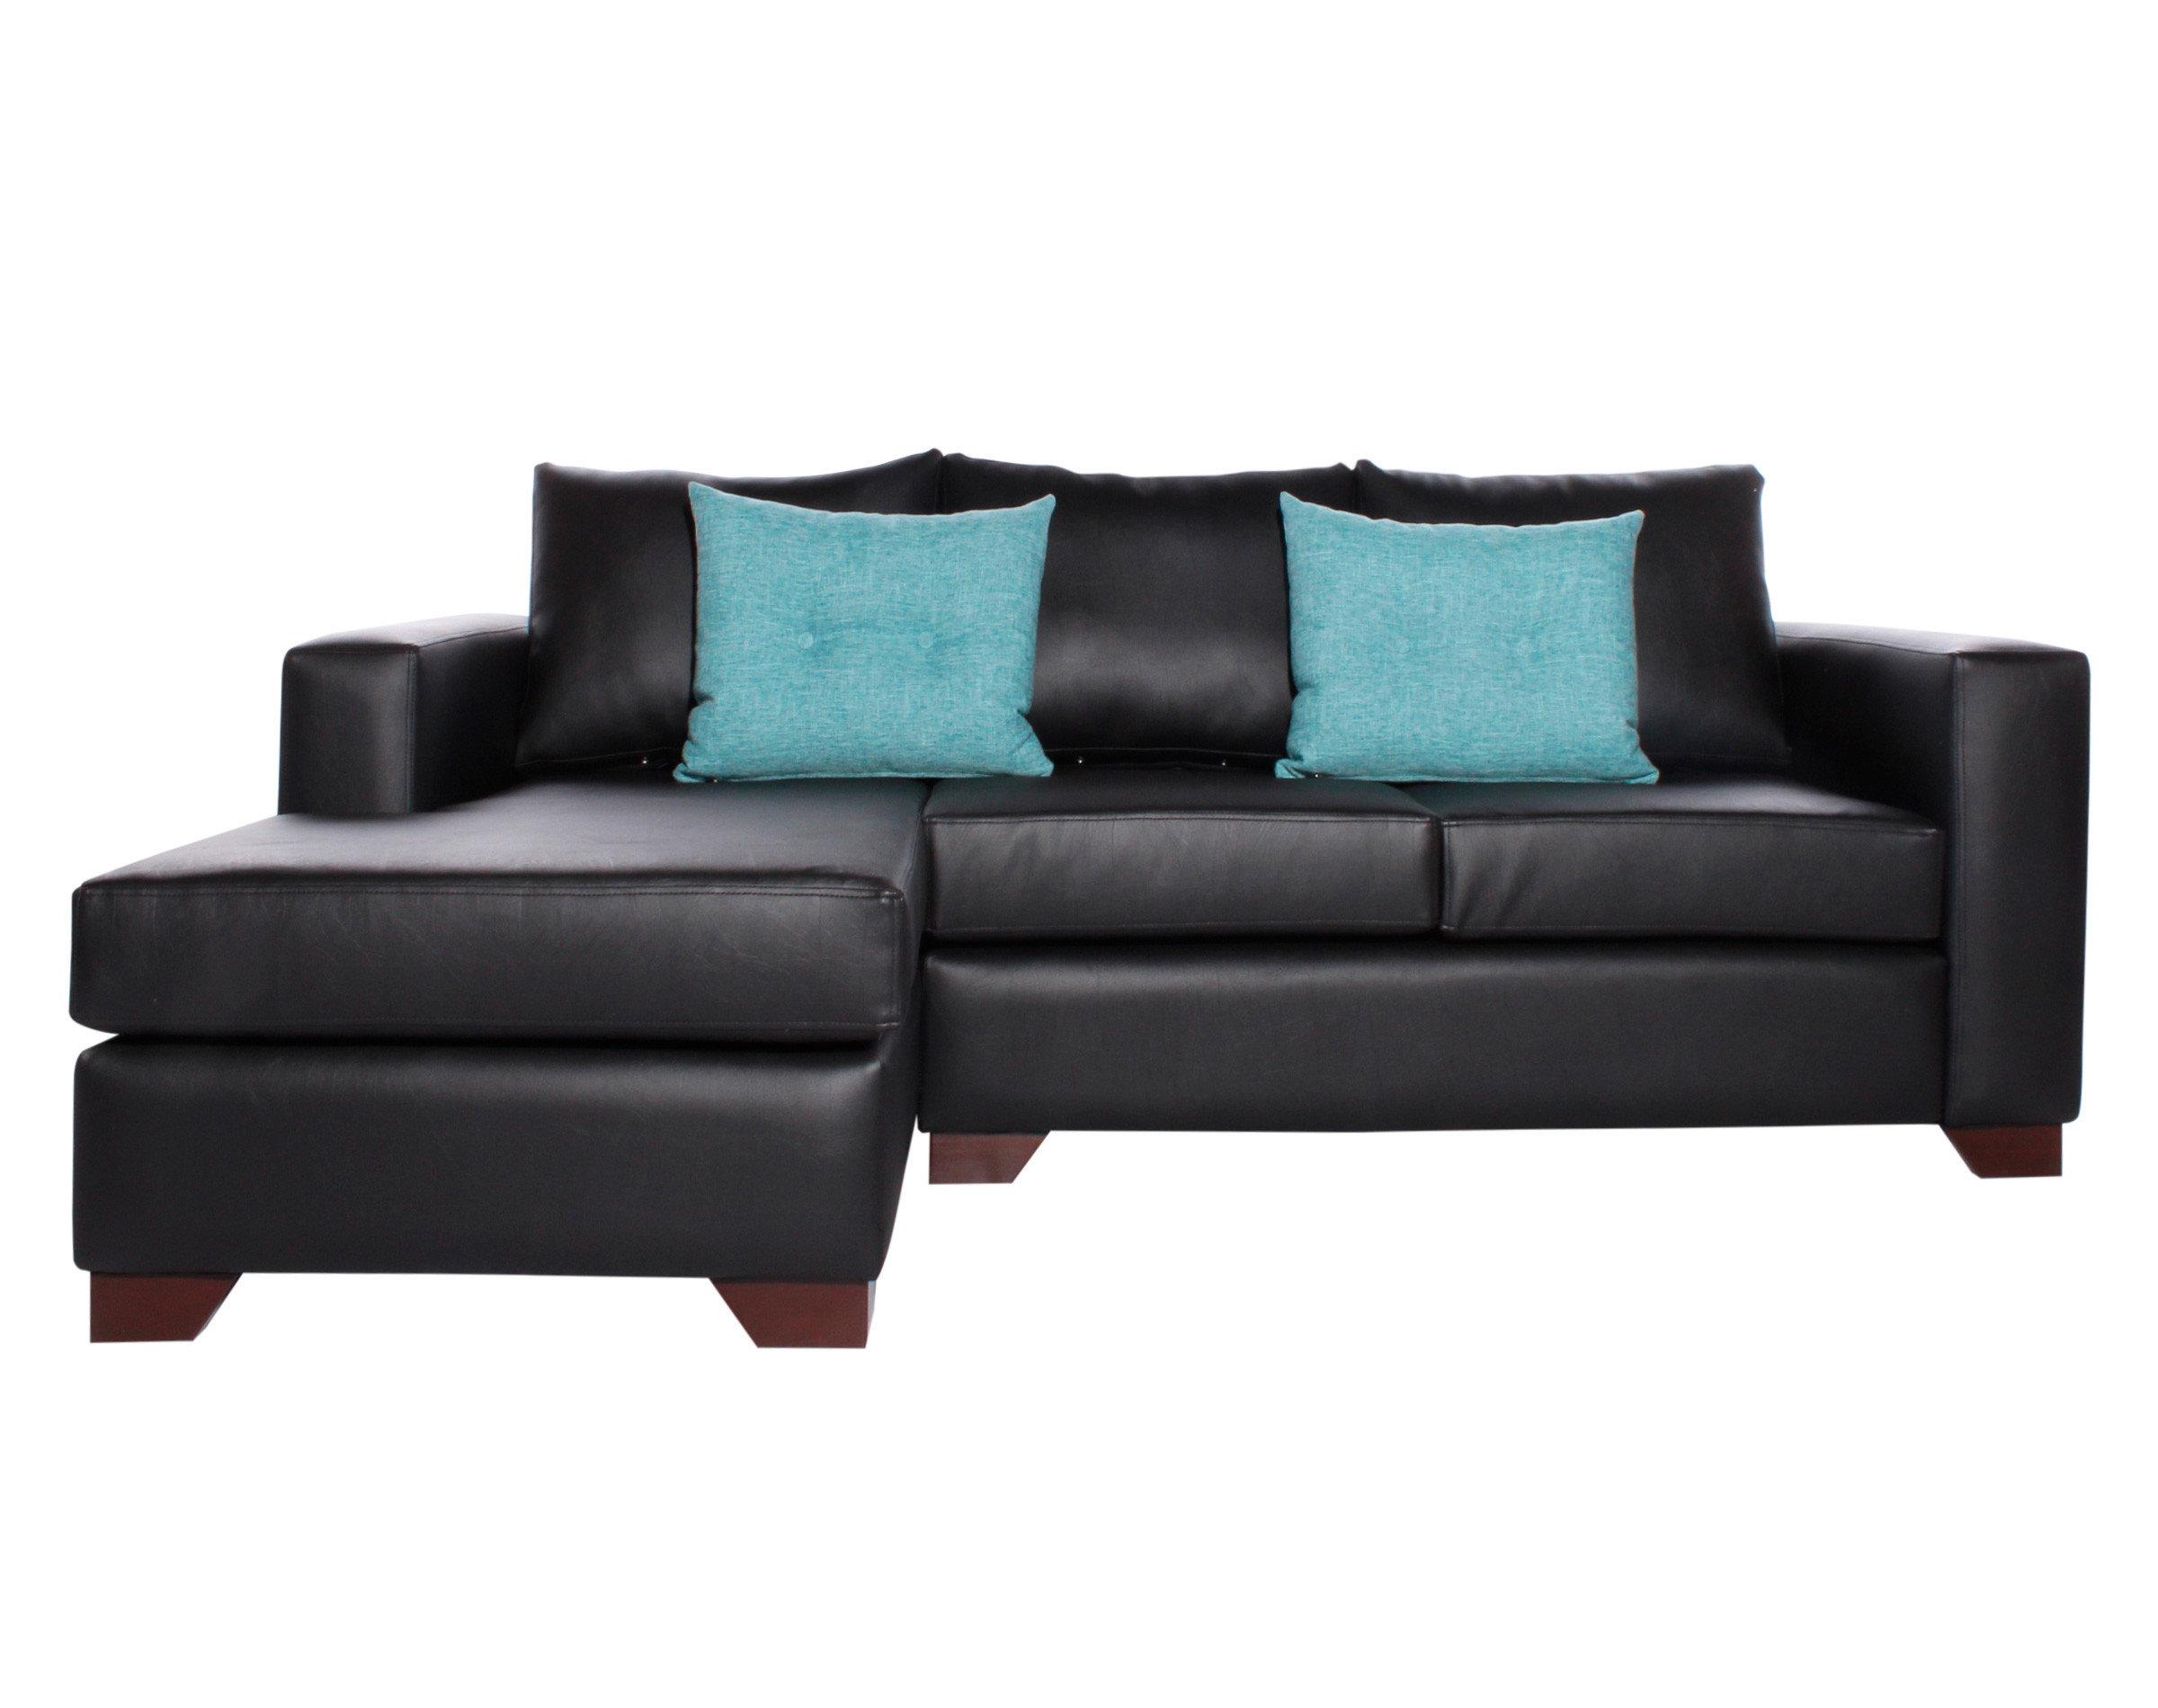 Sofa Seccional Izquierdo Monaco Cuero Sintetico PU Pana